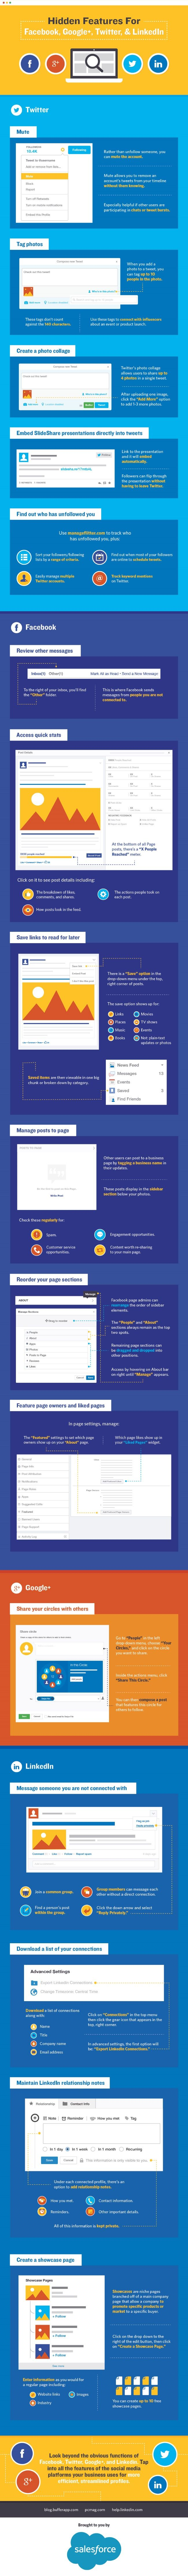 Facebook, Google+, Twitter, LinkedIn Hidden Features - Infographic